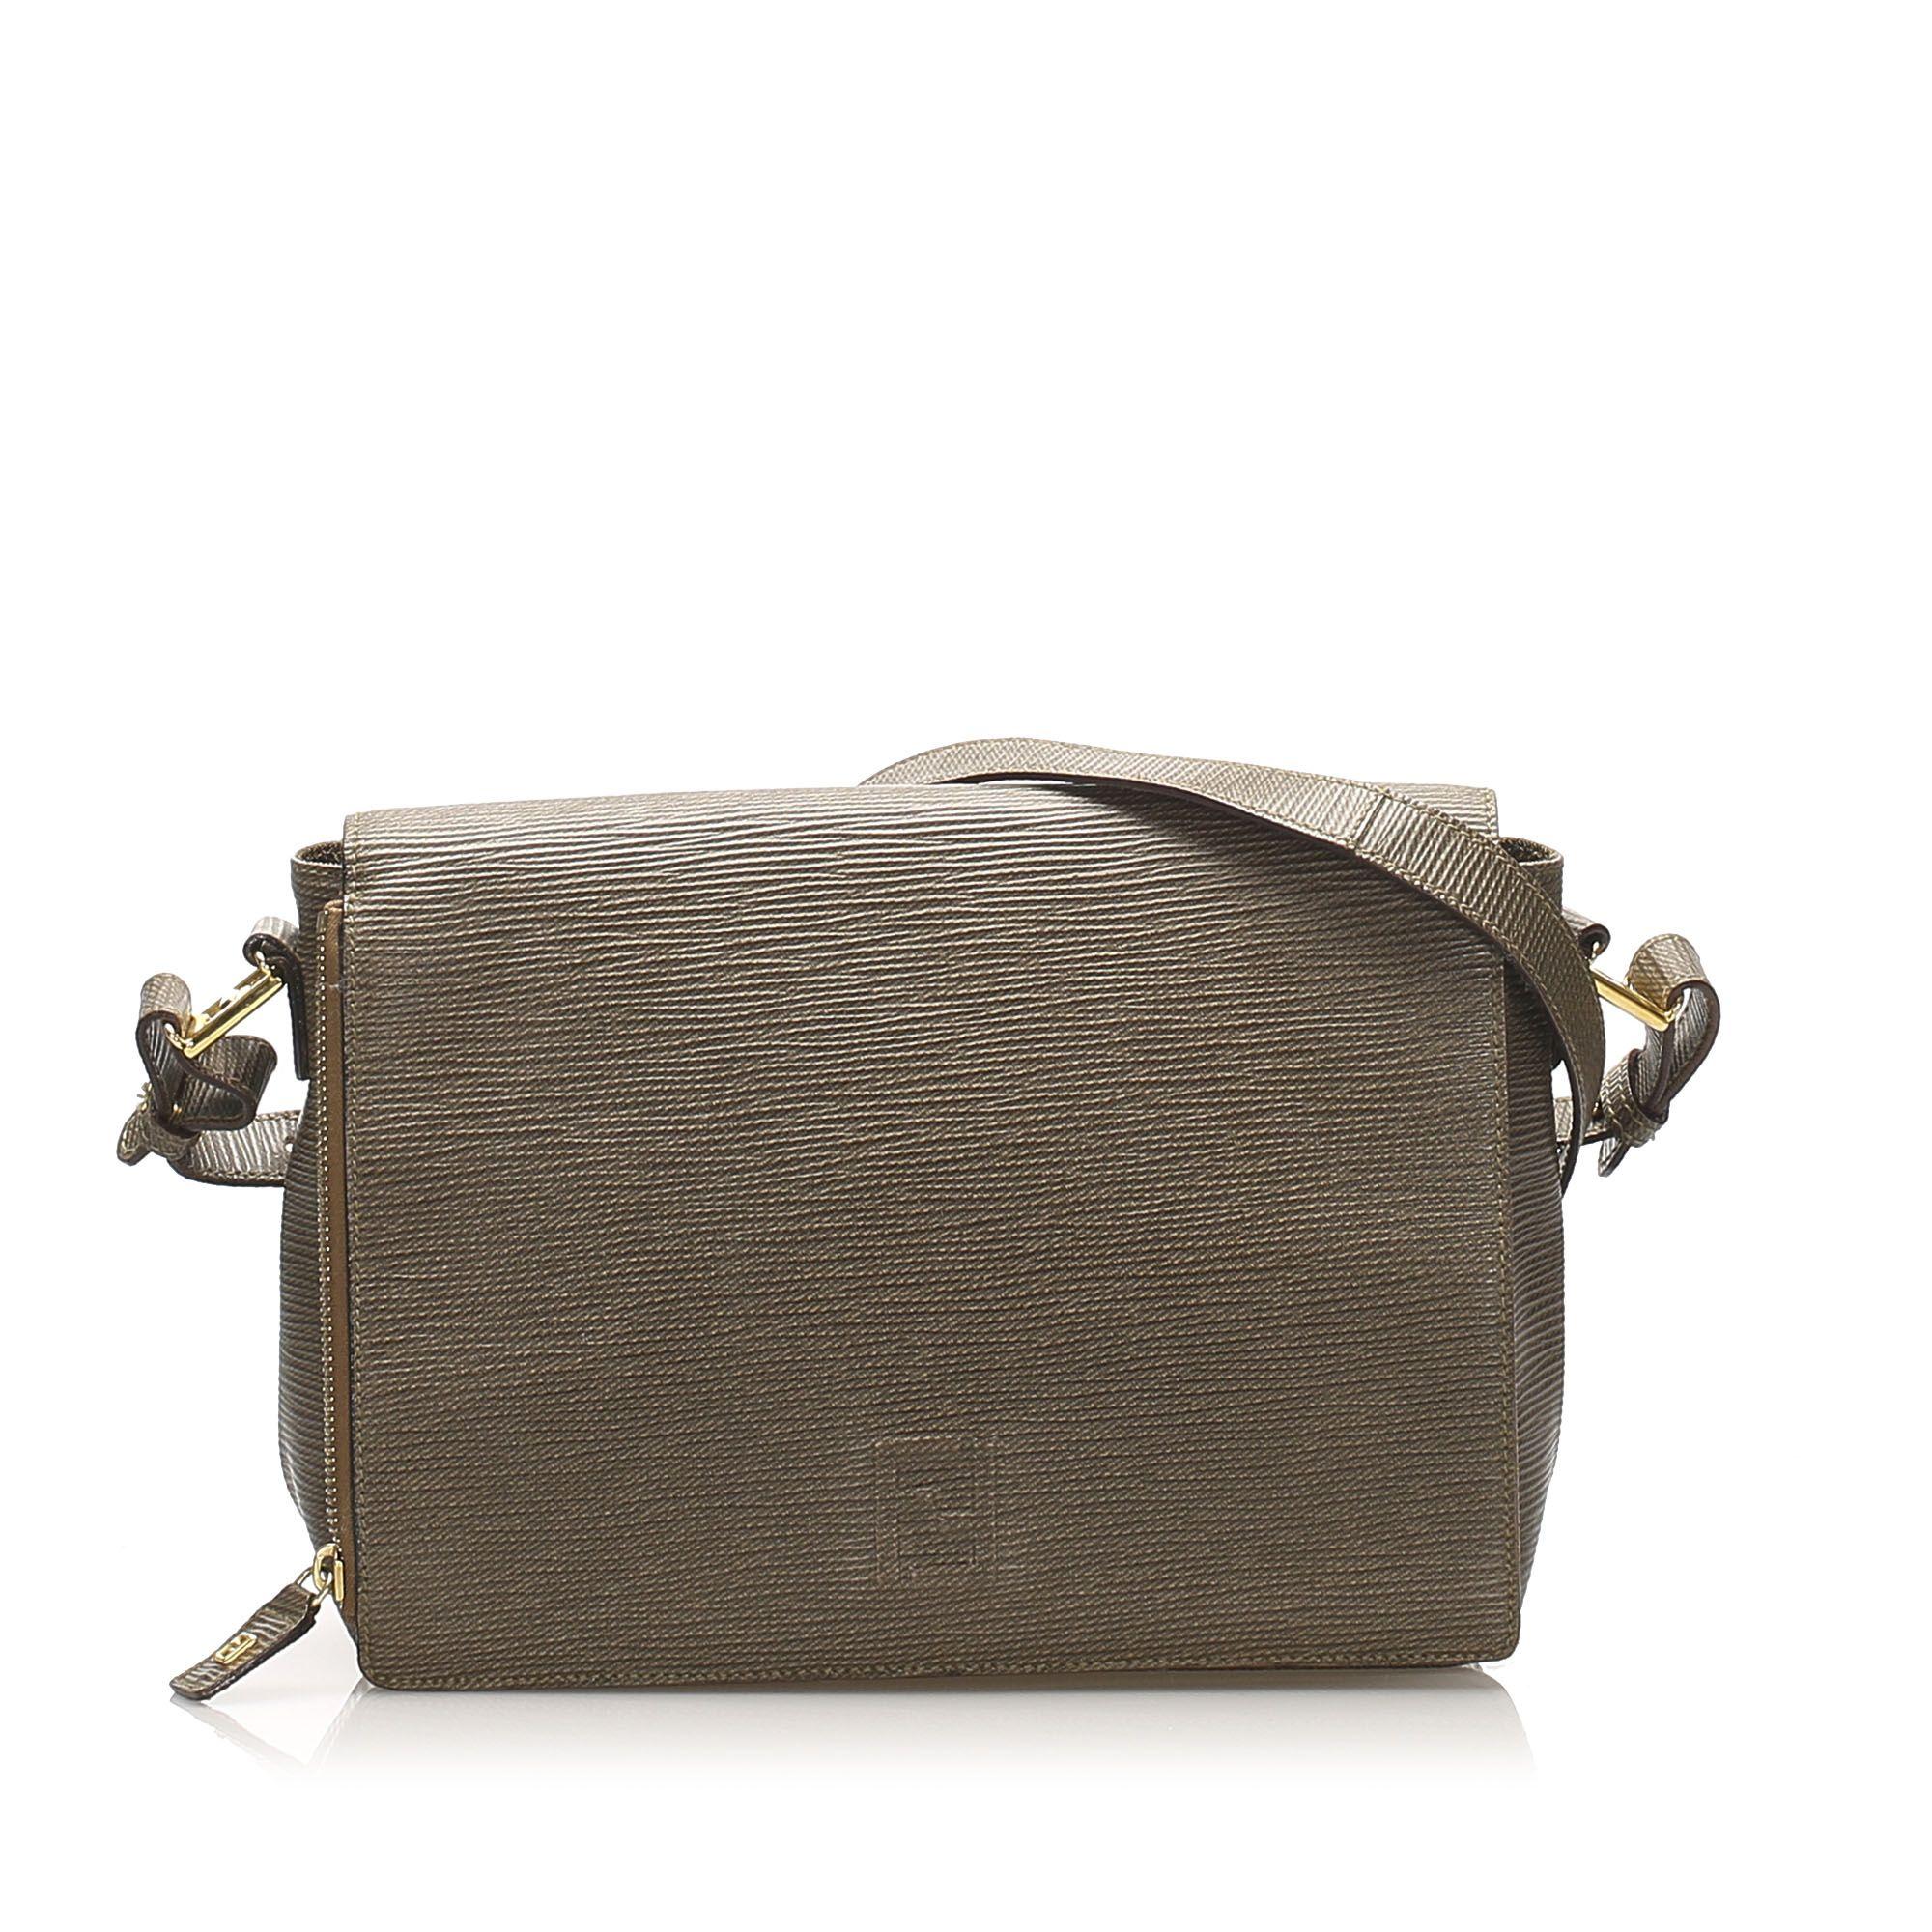 Vintage Fendi Leather Crossbody Bag Brown